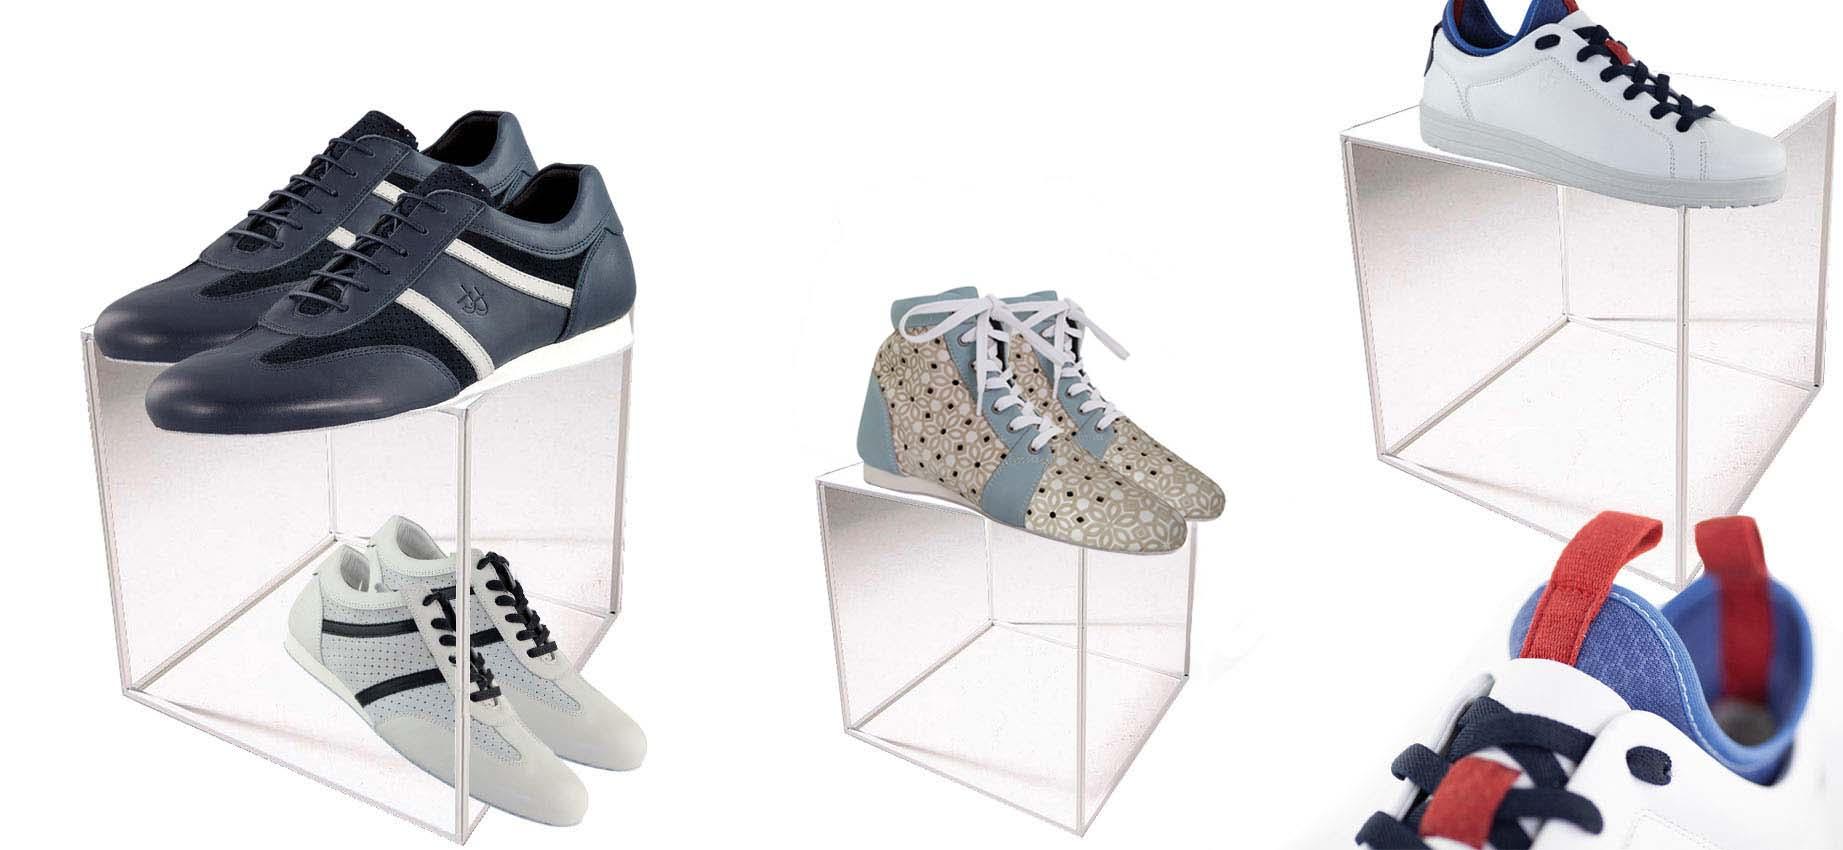 Januar-2020-Tanz-Sneaker-Damen-und-Herren3WtcxndqN35S7